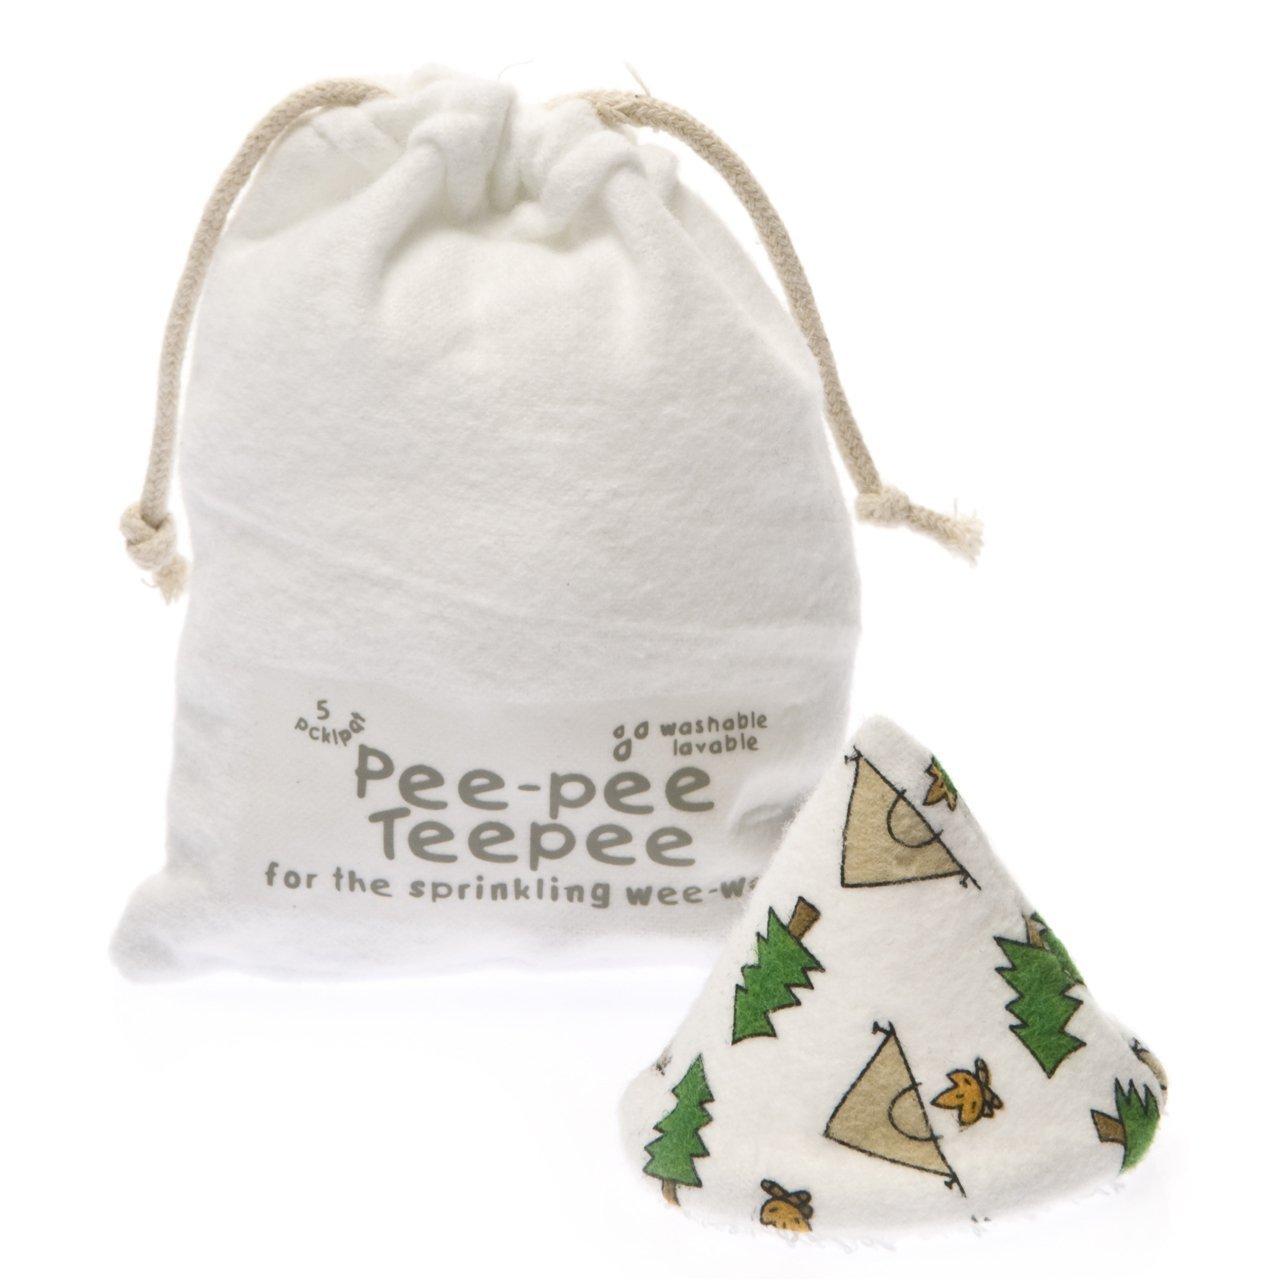 Pee-pee Teepee Camping White - Laundry Bag Beba Bean PT3078